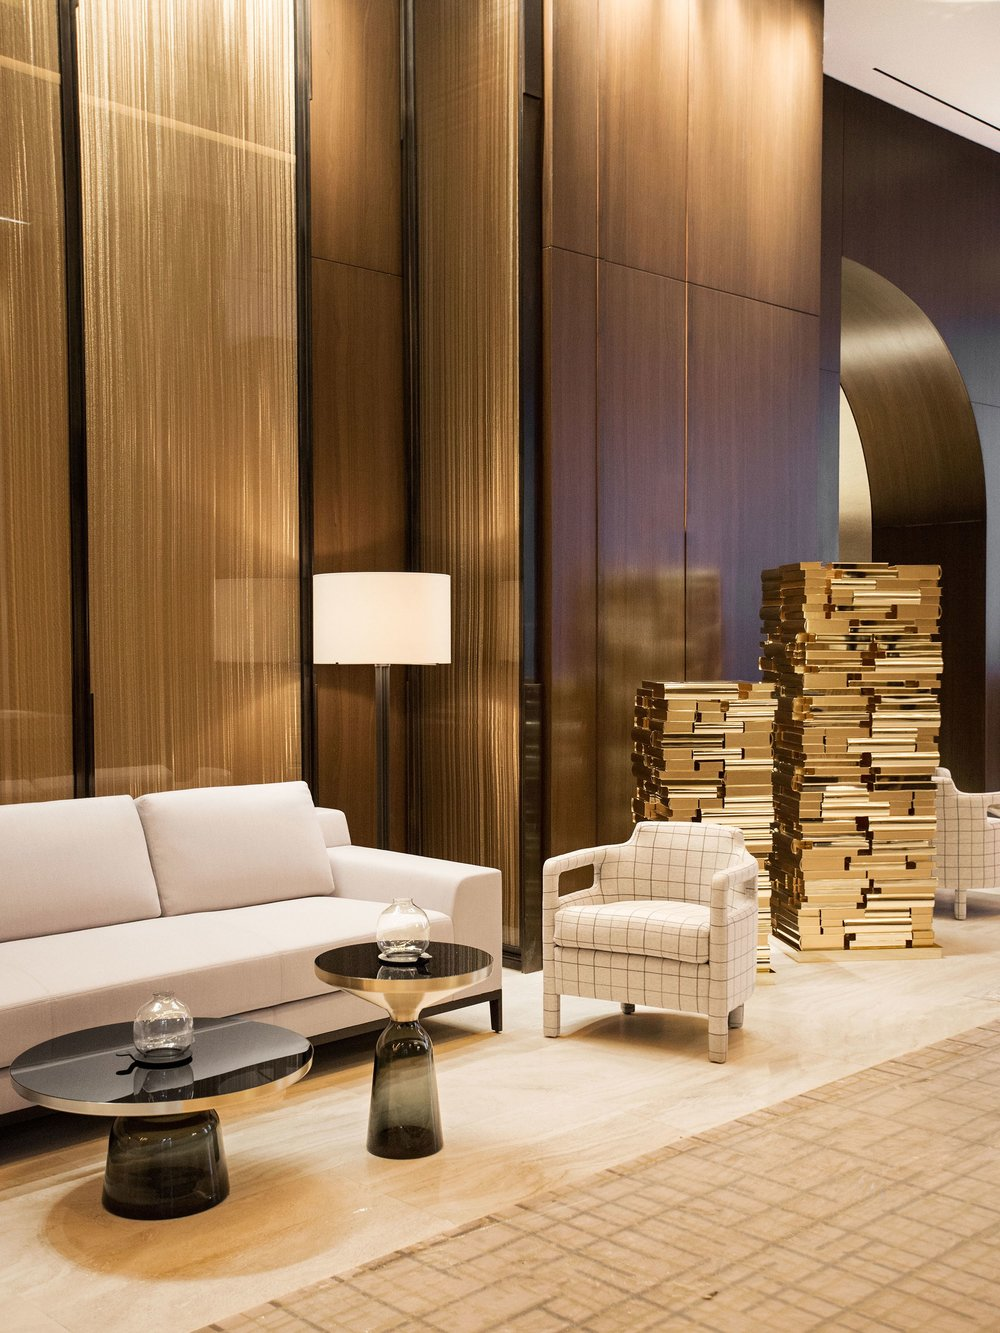 The Four Seasons Hotel Downtown - New York, New York